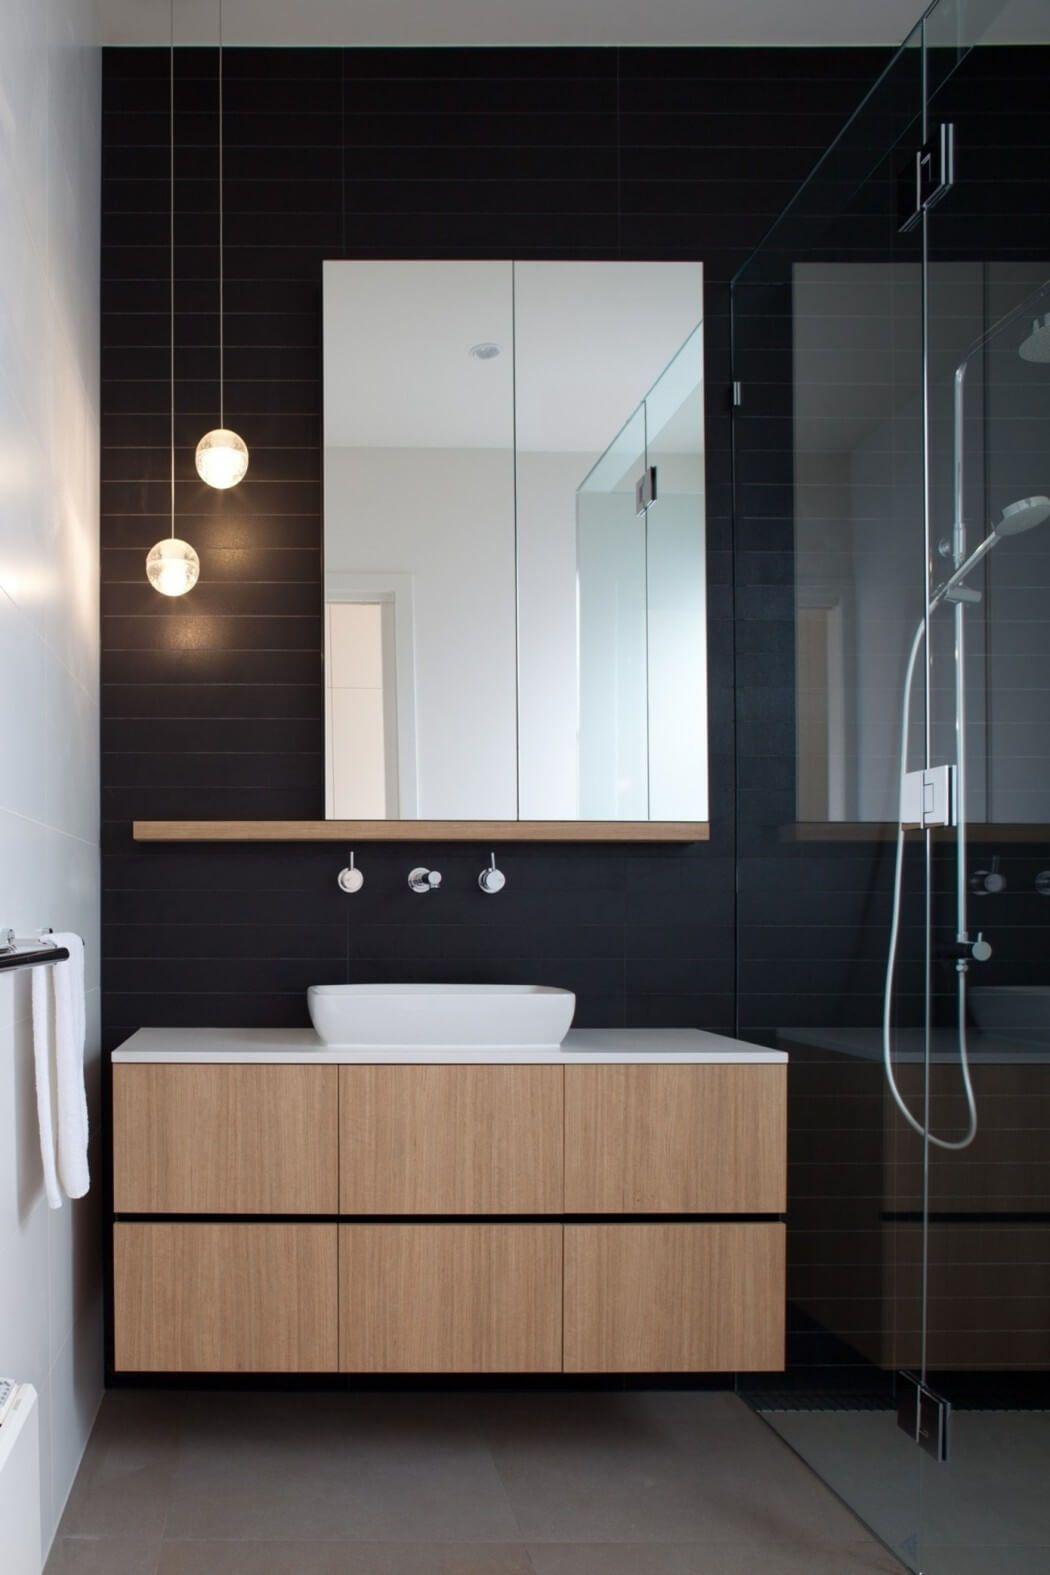 bathroom lighting melbourne.  bathroom sep 25 121 bathroom vanity ideas with lighting melbourne h